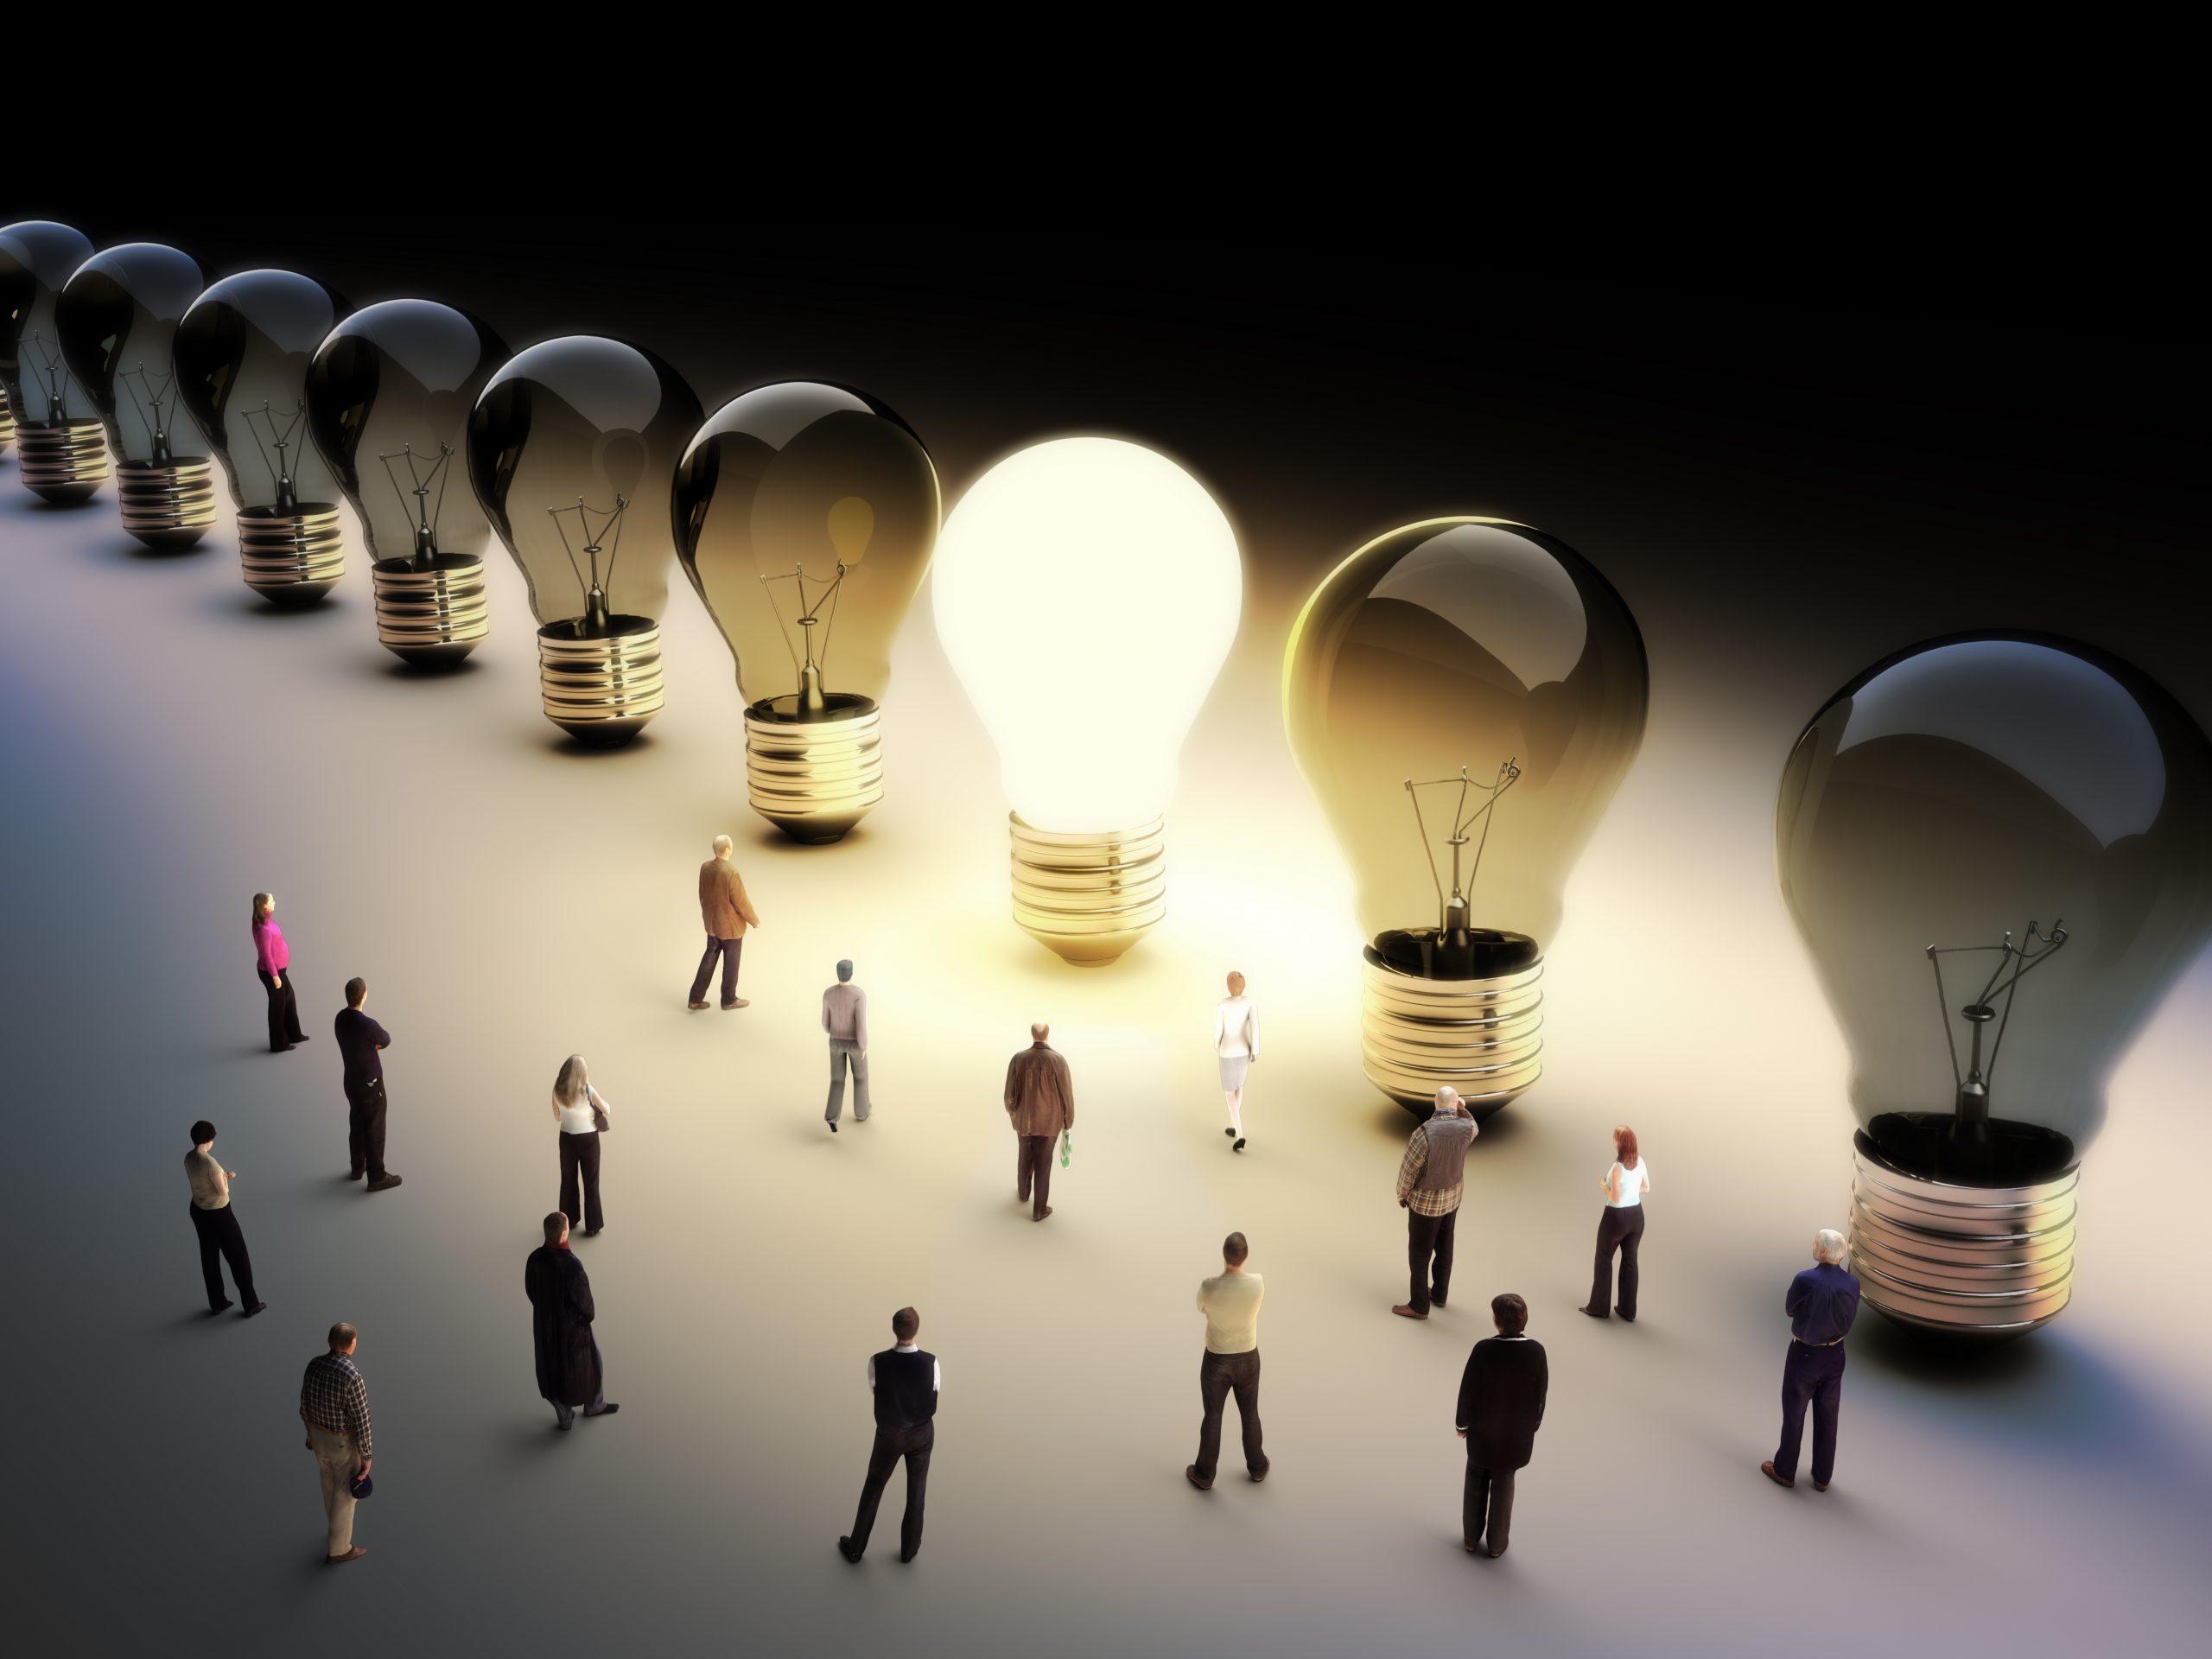 Patent Wisdom - https://depositphotos.com/26343203/stock-photo-moving-to-the-light.html